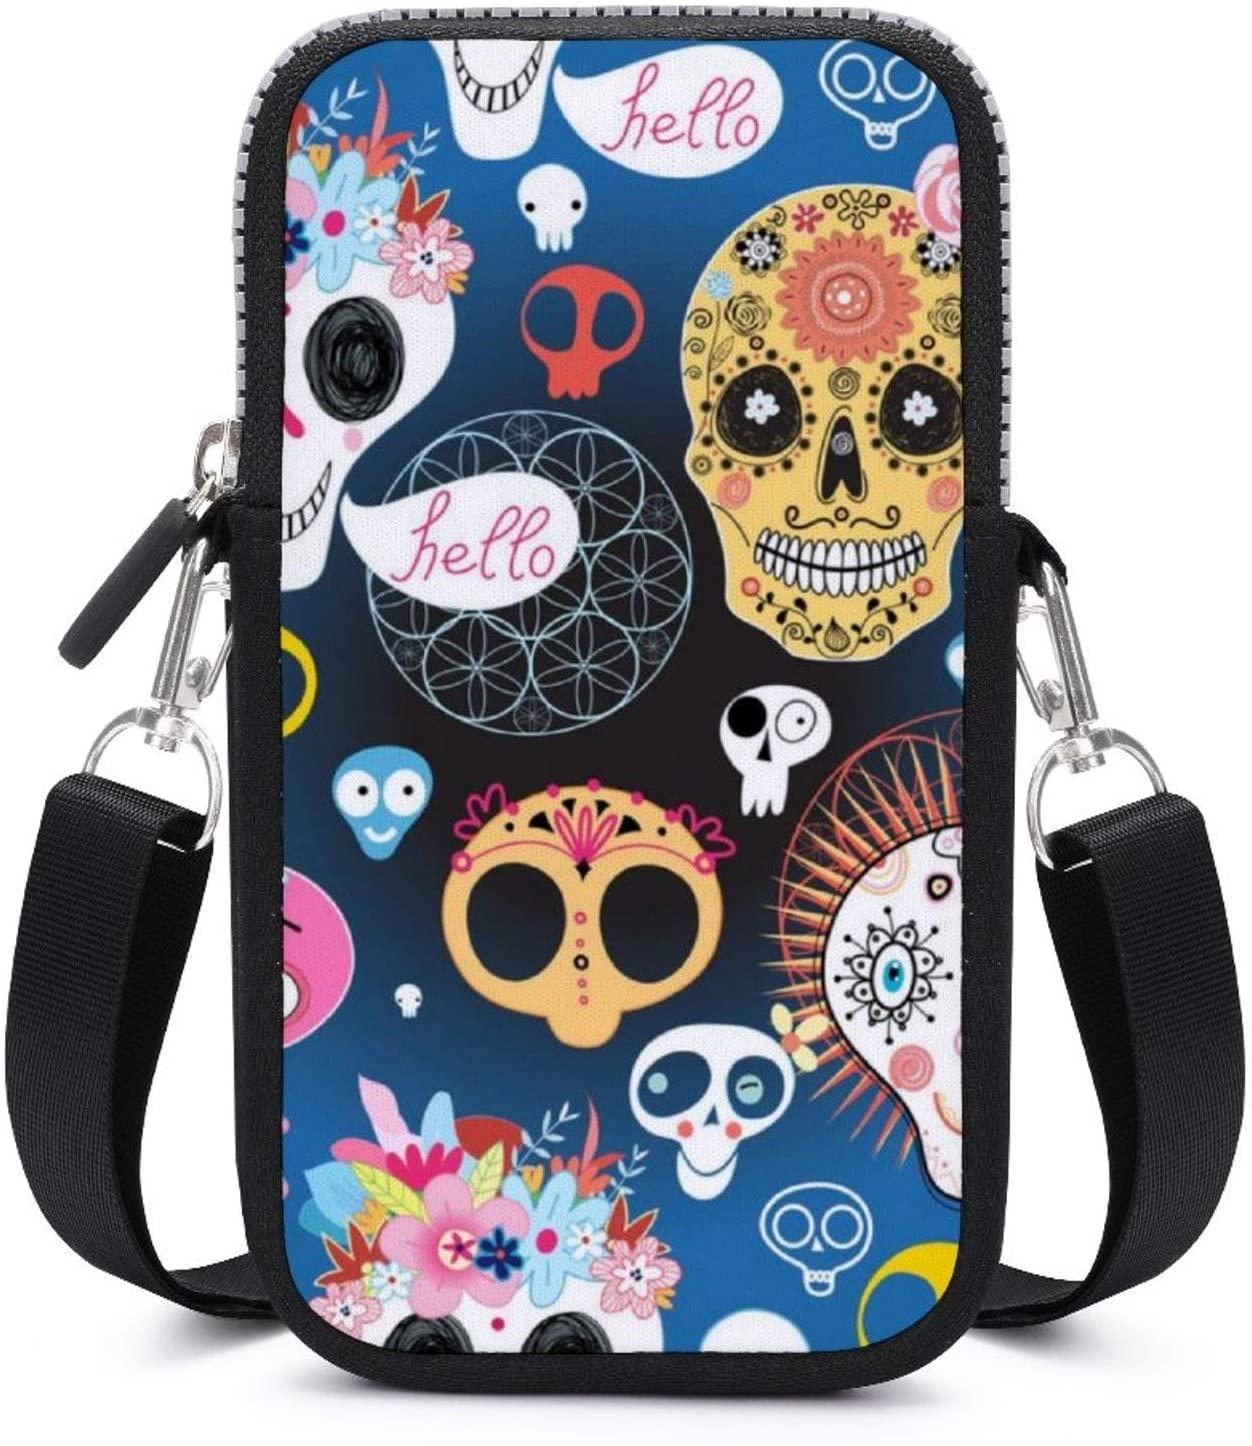 NiYoung Women Small Crossbody Phone Bag for Women - Fashion Cellphone Shoulder Bags Card Holder Wallet Purse (Cheerful Skulls Pattern)